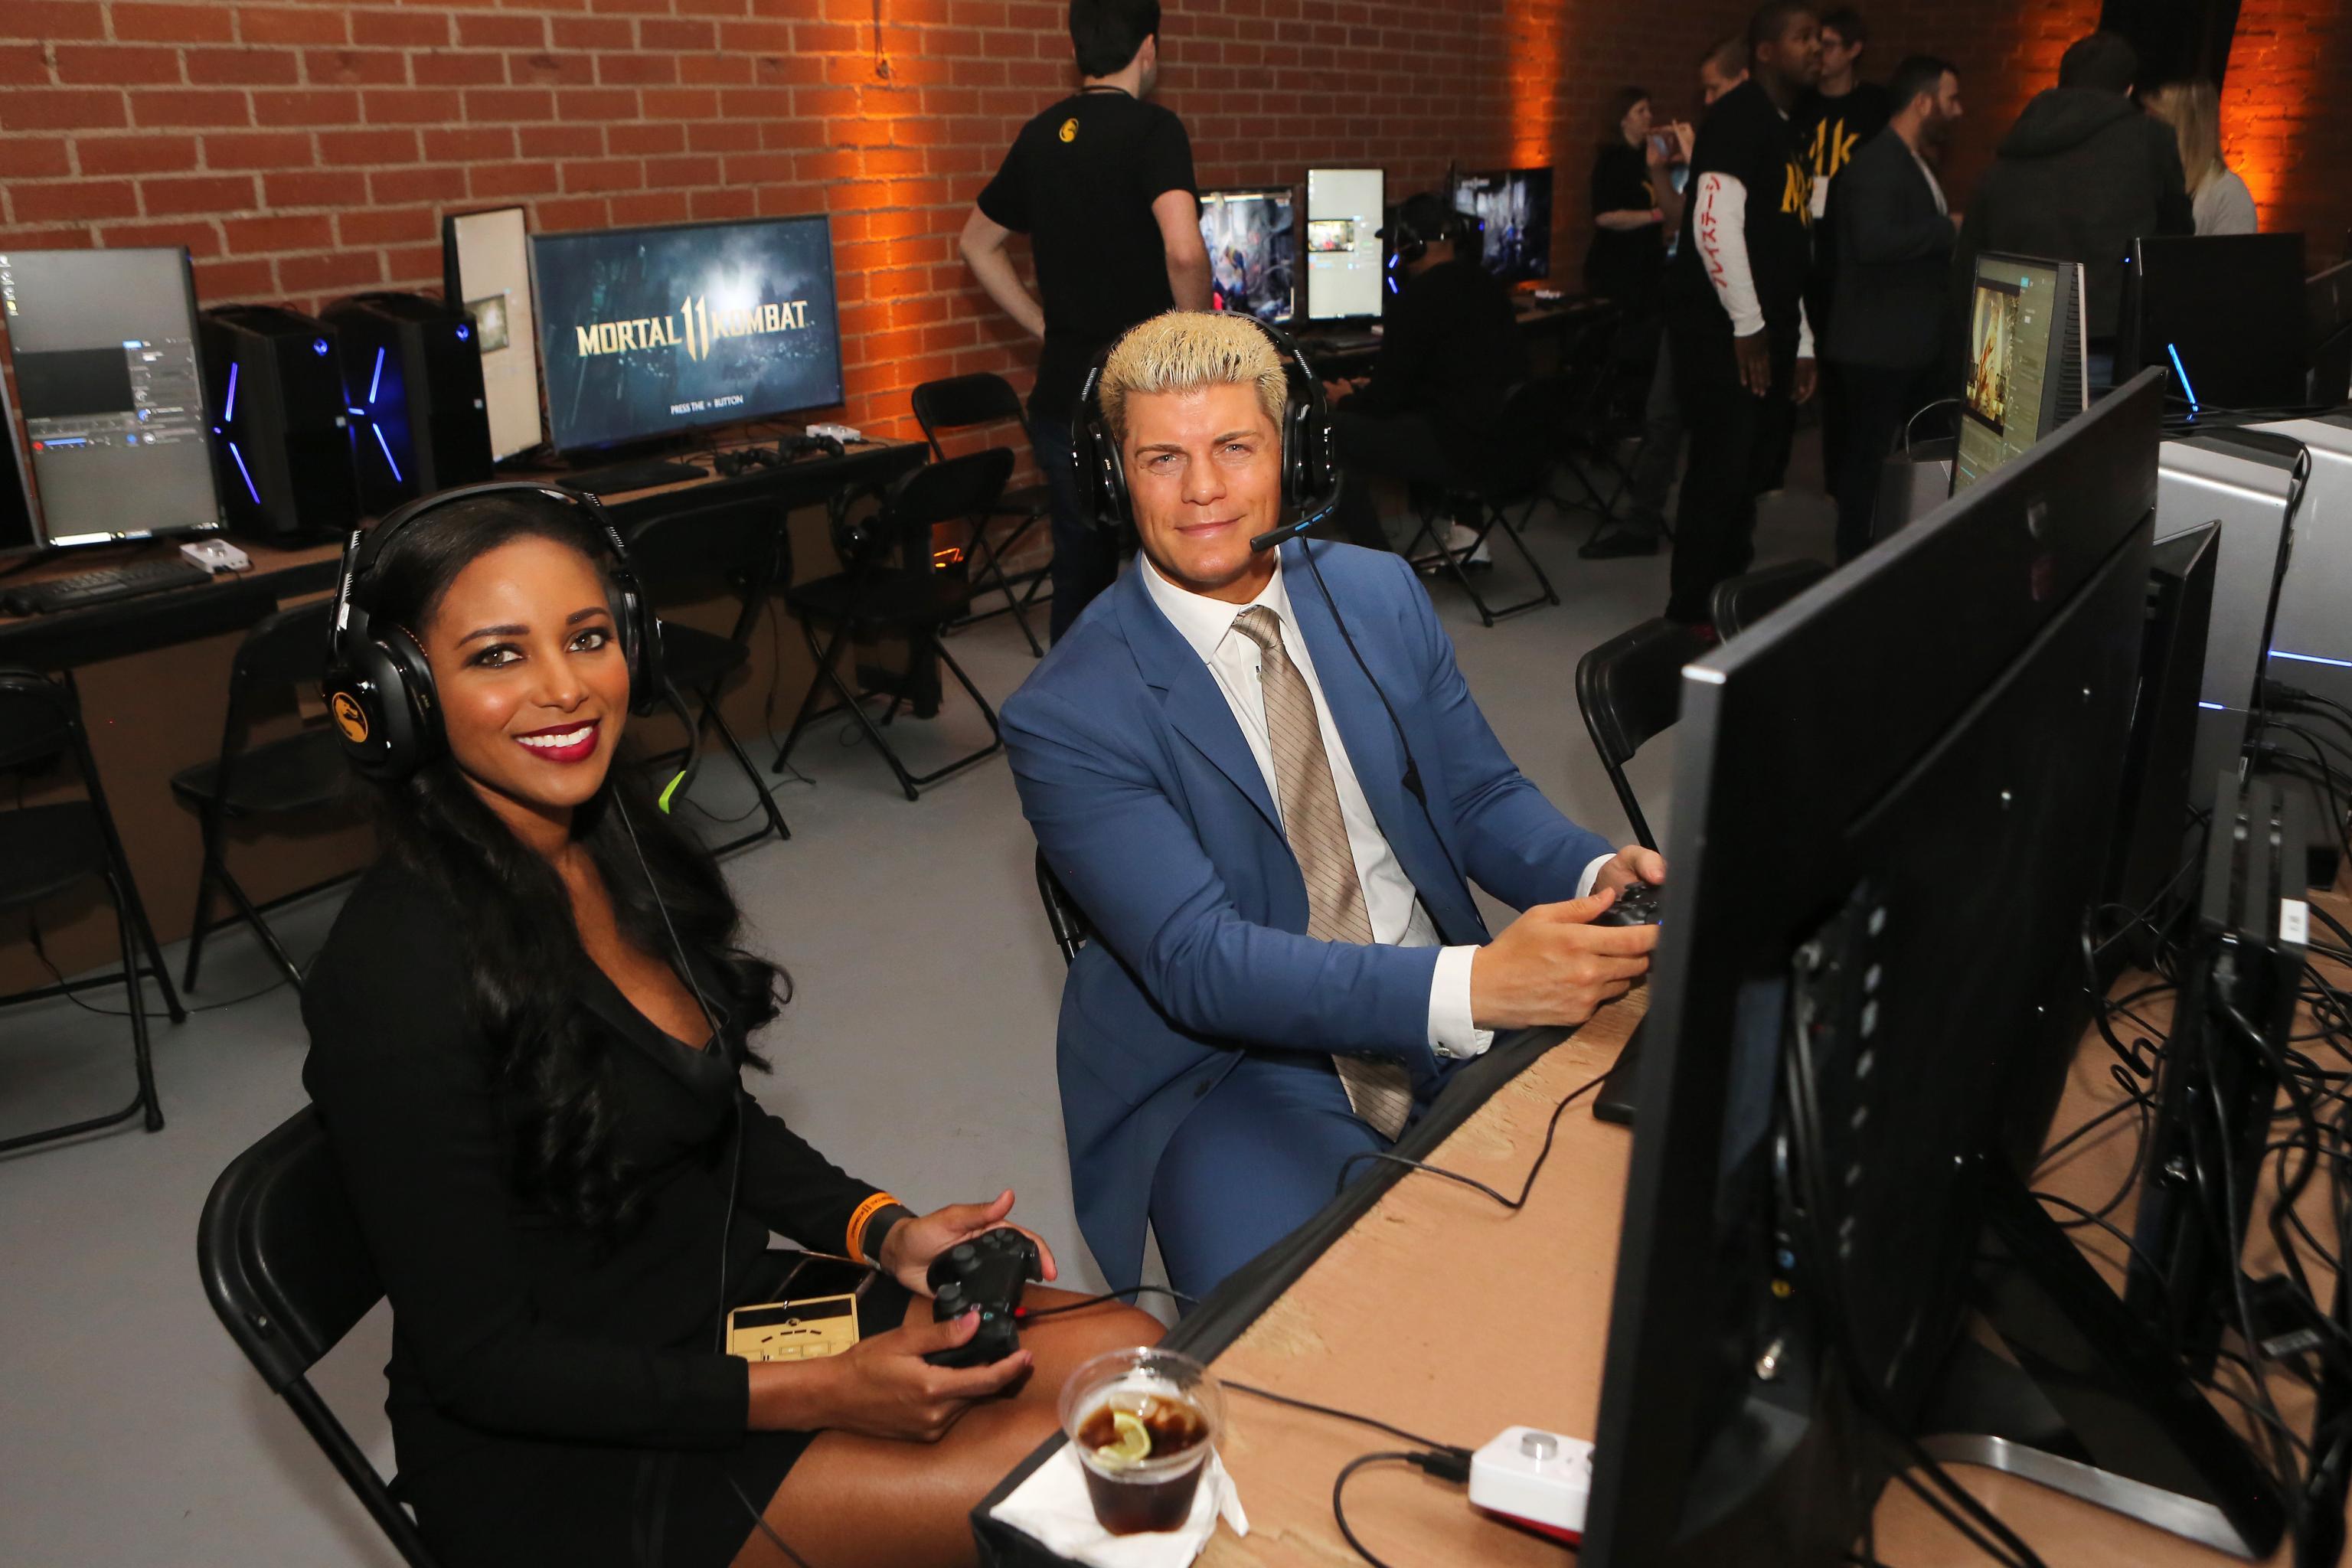 All Elite Wrestling, WarnerMedia Announce AEW Weekly TV